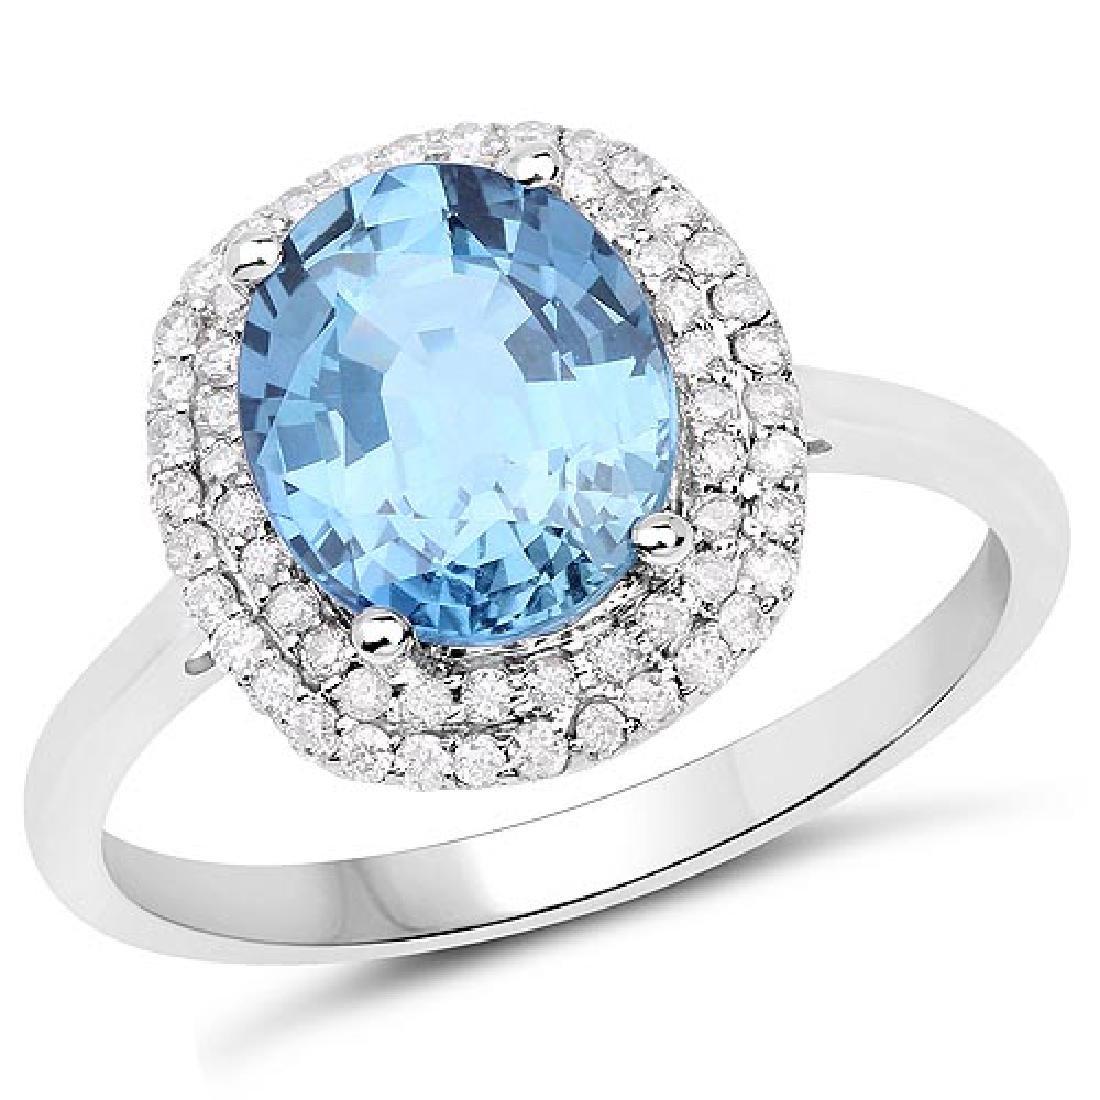 2.52 Carat Genuine Blue Sapphire and White Diamond 14K